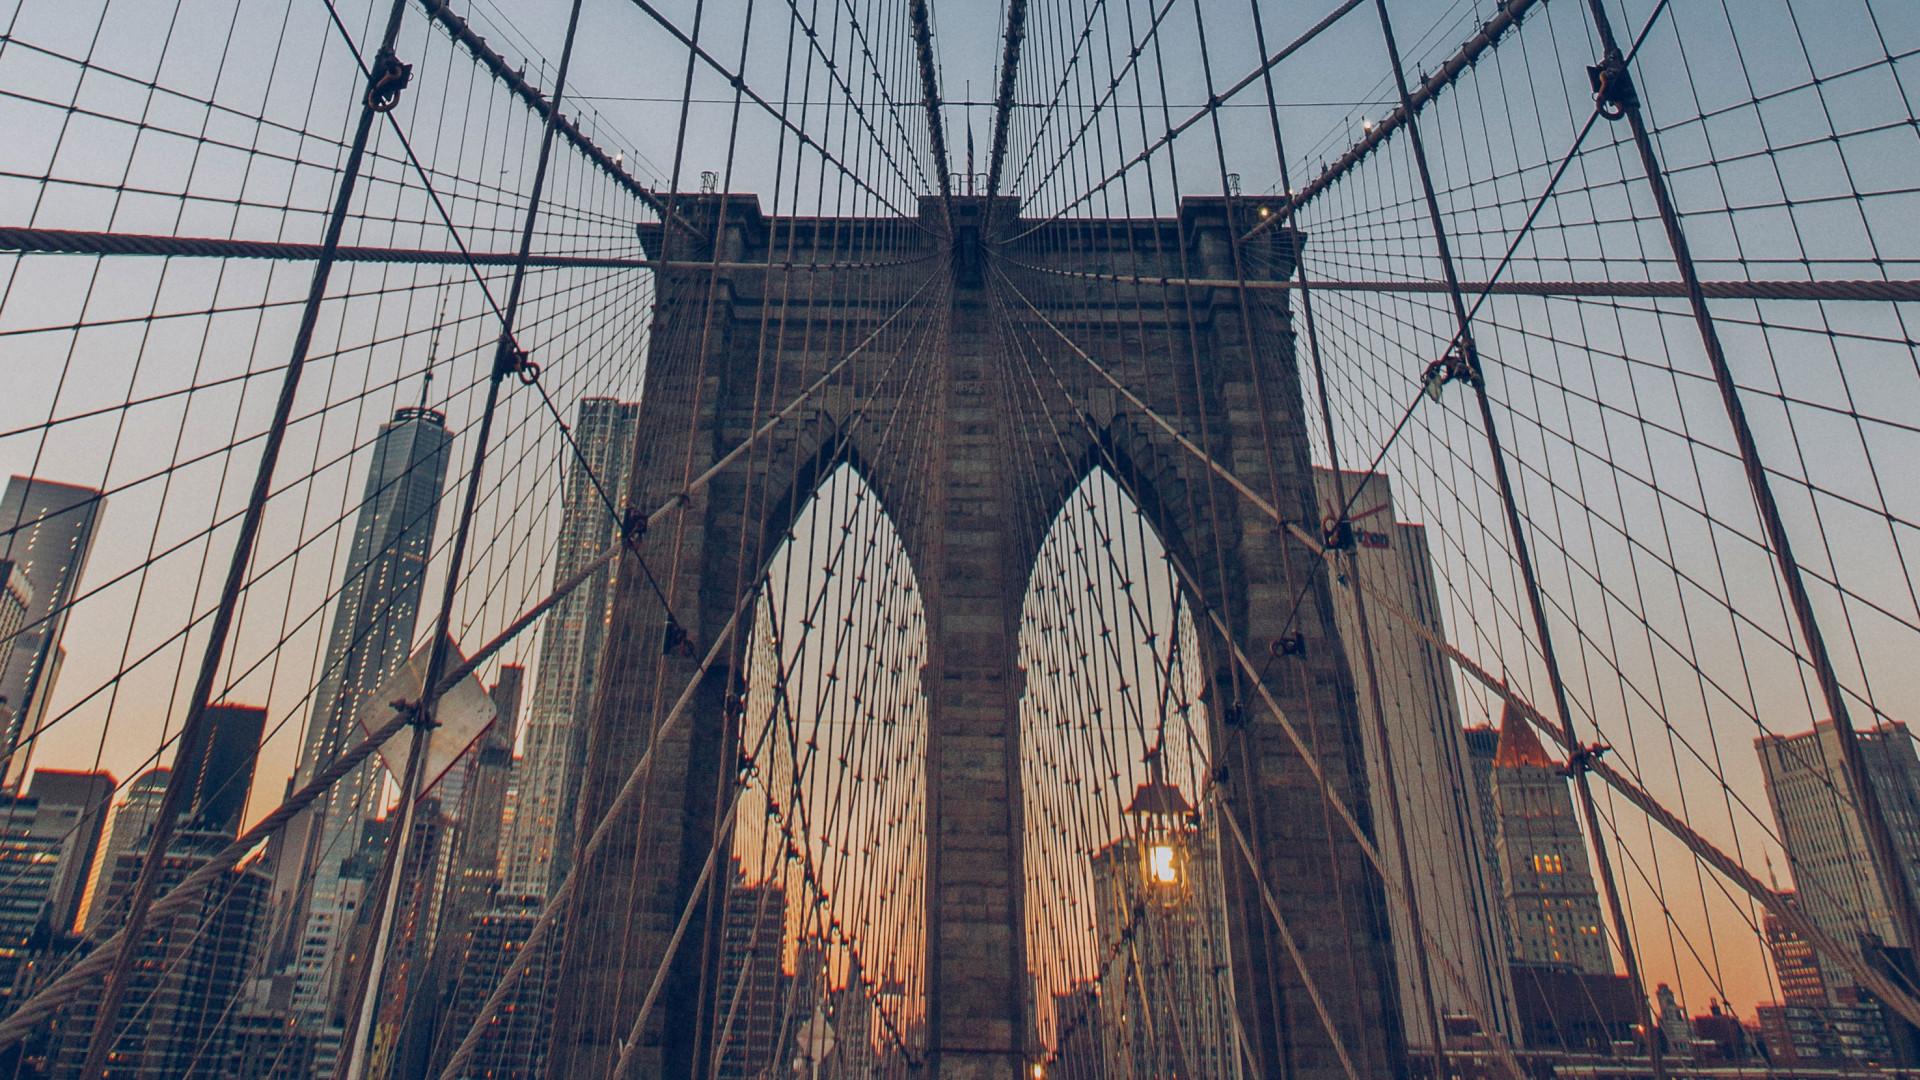 Brooklyn Bridge during a winter sunset